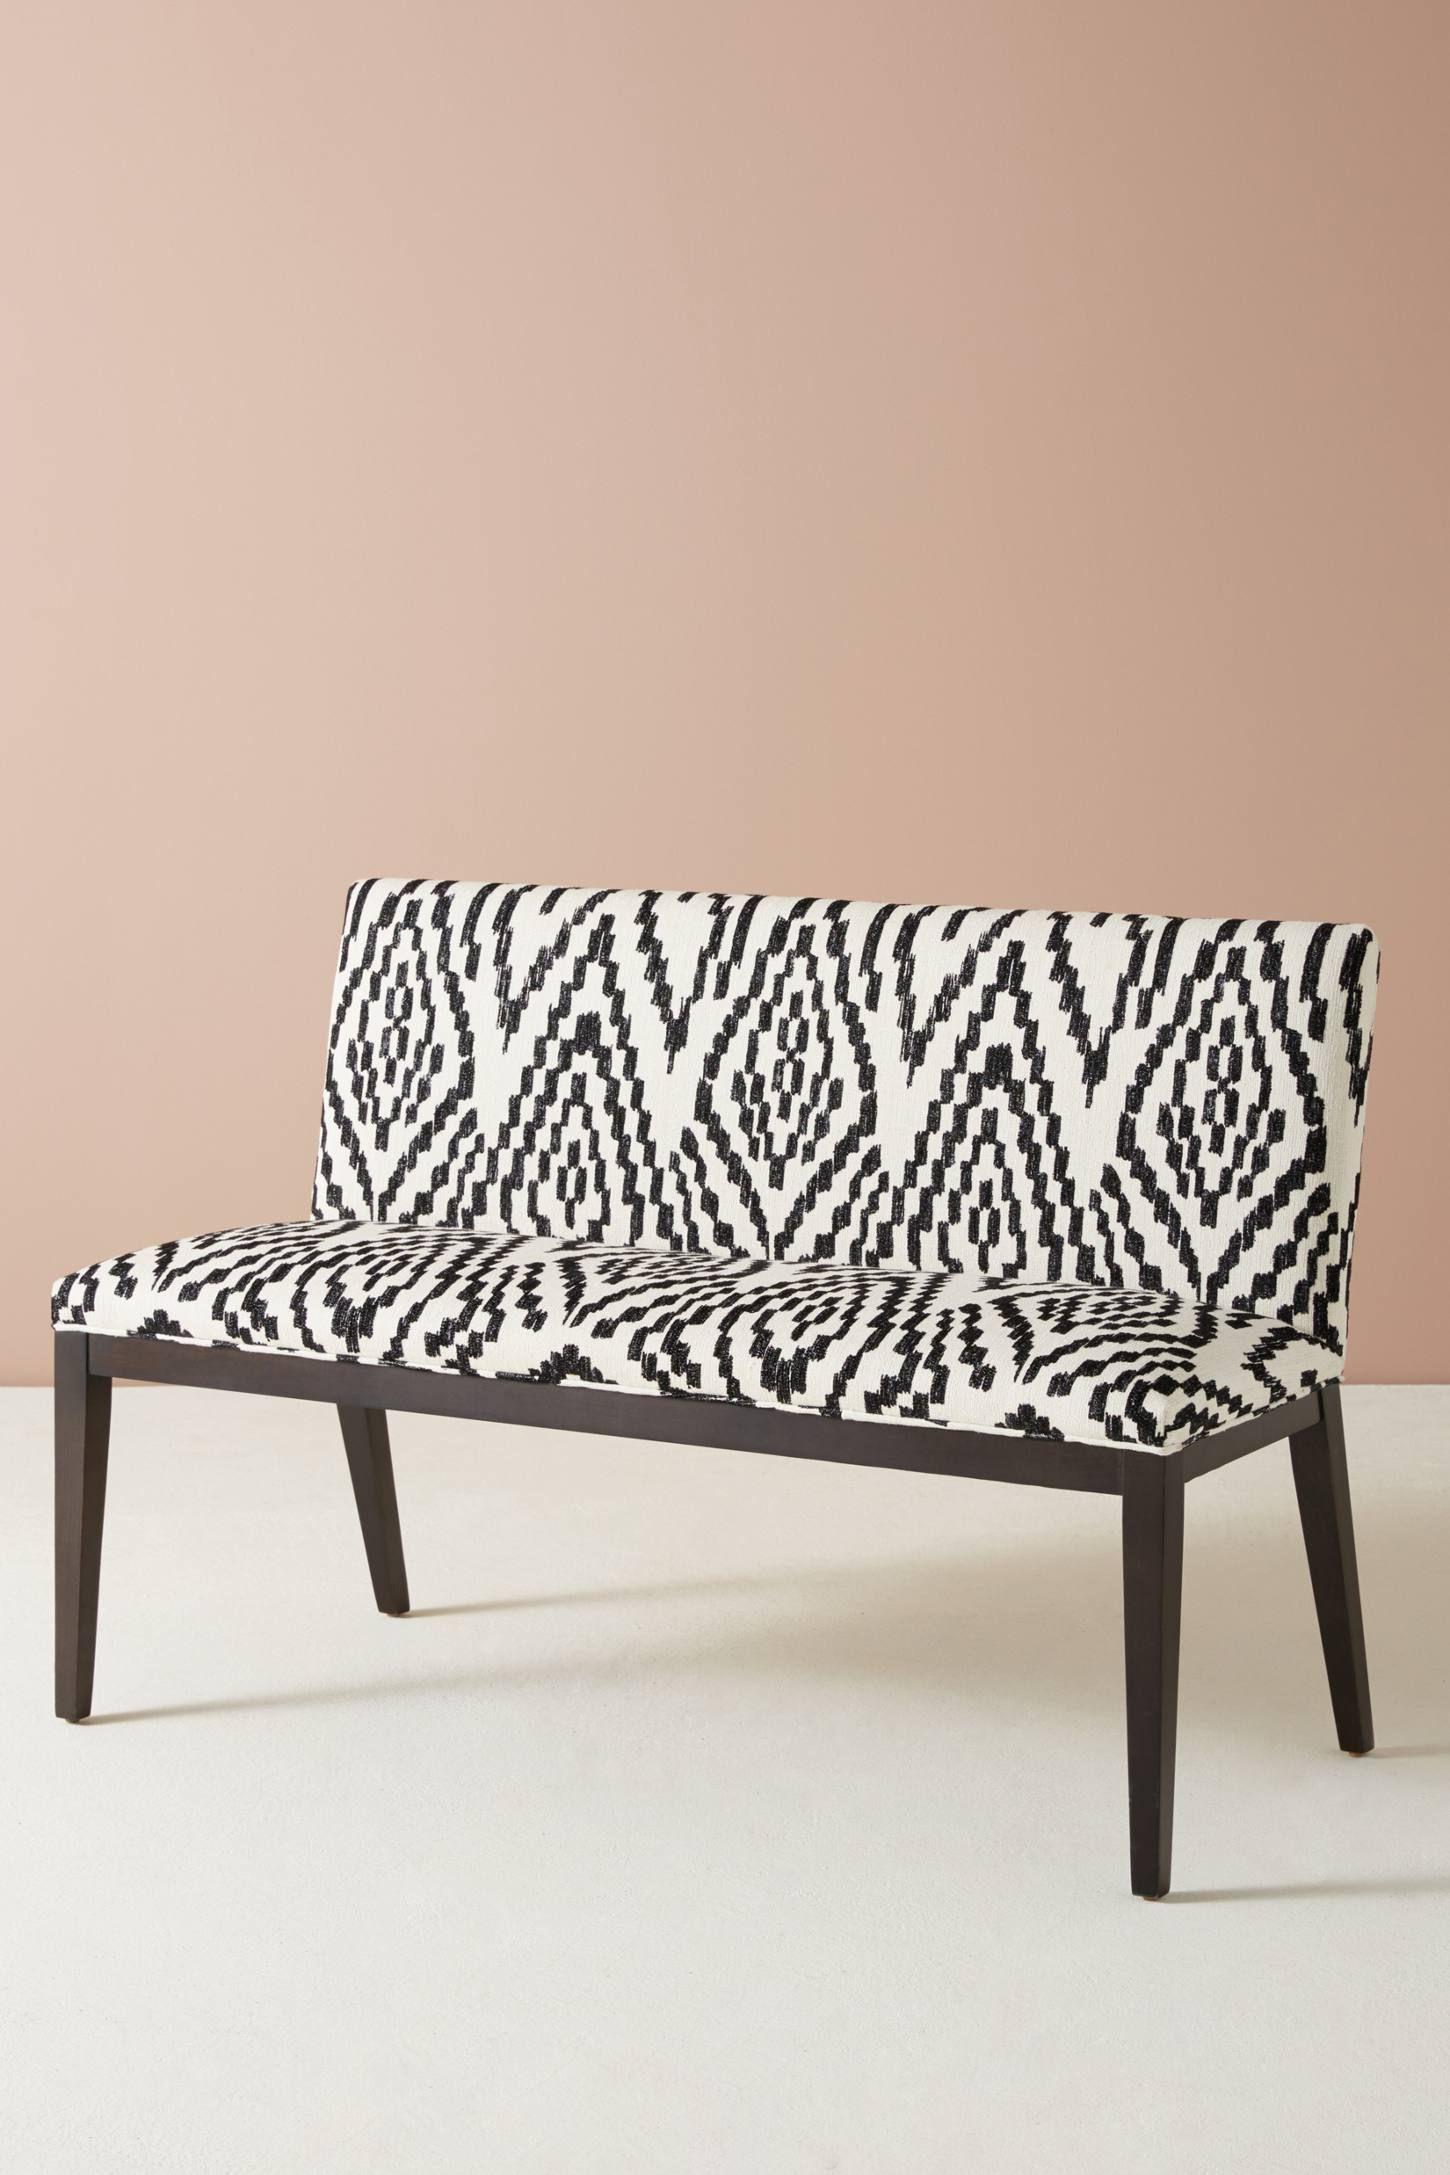 Astonishing Maura Printed Emrys Bench Cassie Dining Room Bench Ibusinesslaw Wood Chair Design Ideas Ibusinesslaworg